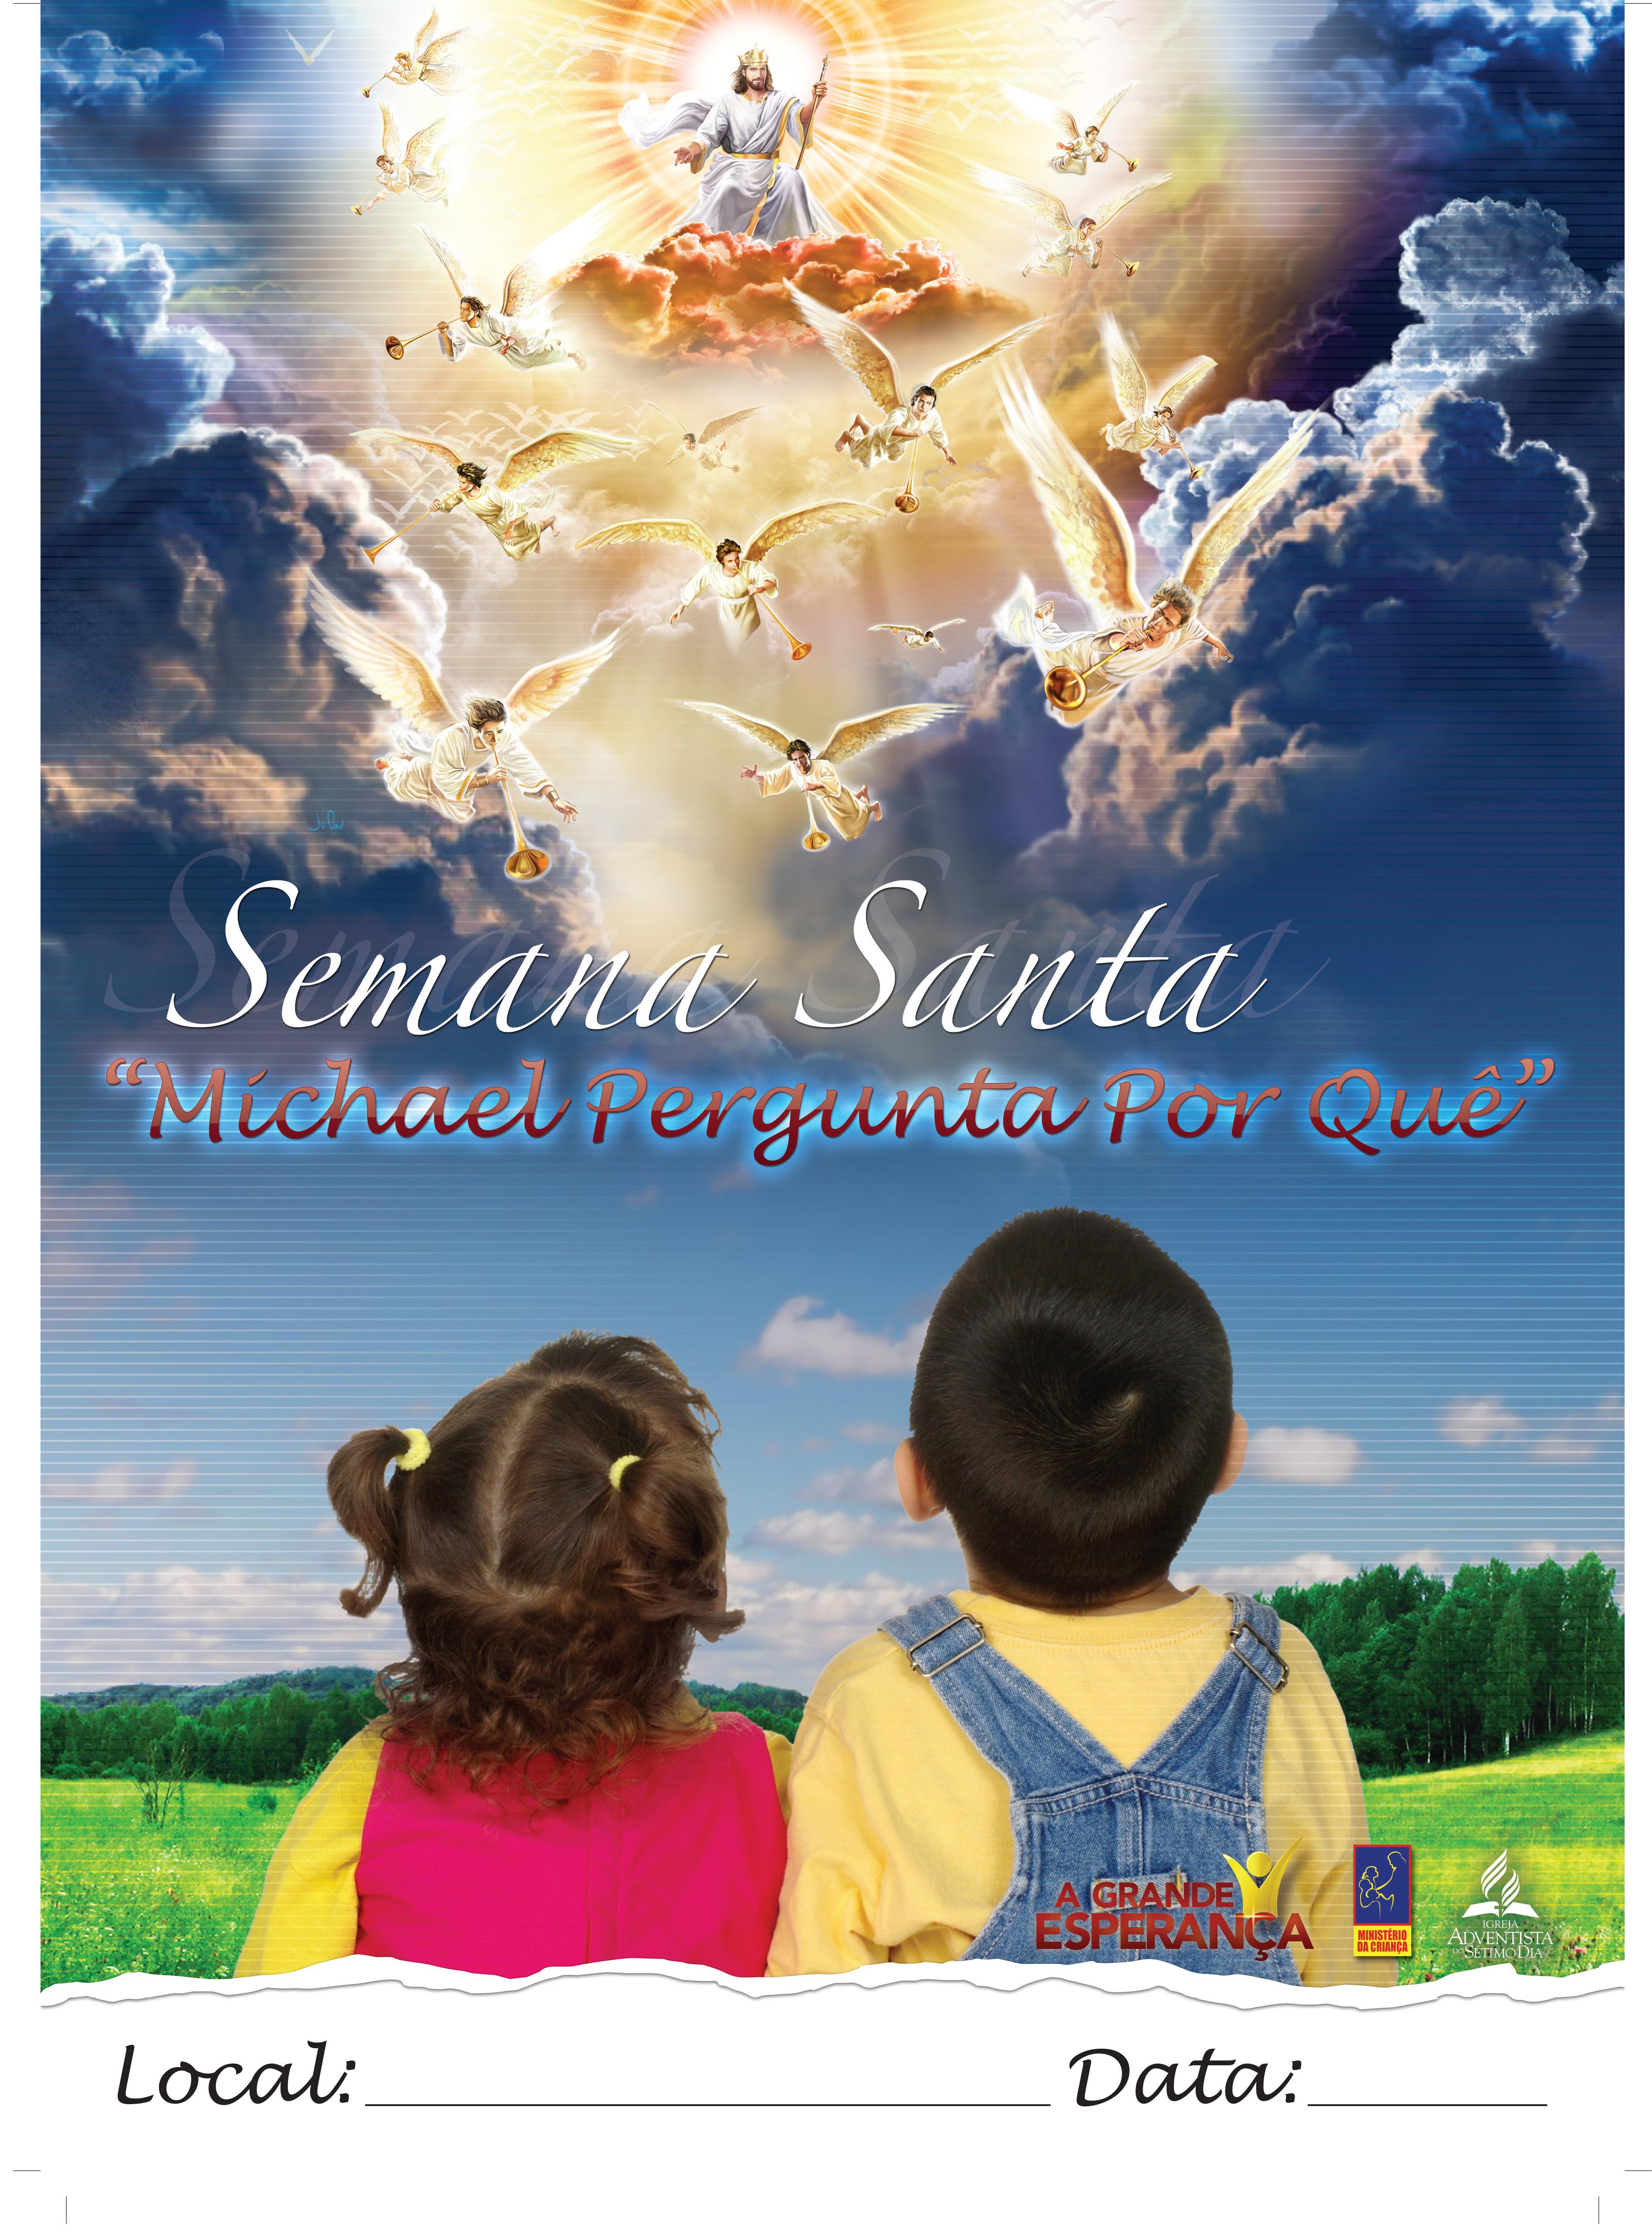 Livreto: Semana Santa Infantil – 2012